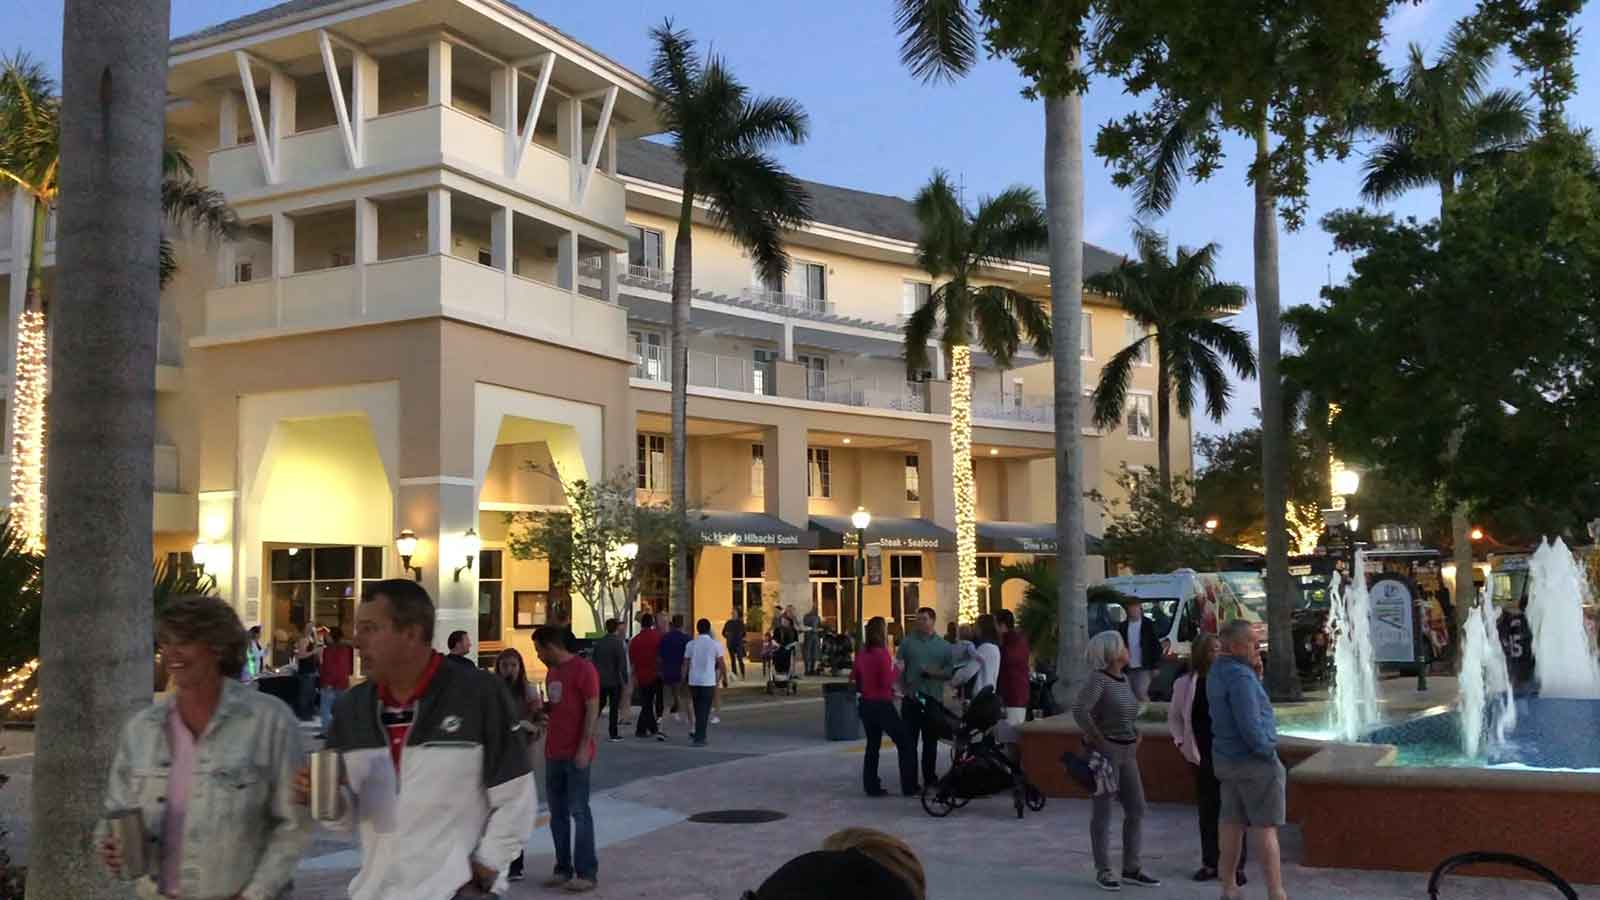 Downtown Abacoa. Jupiter, Florida